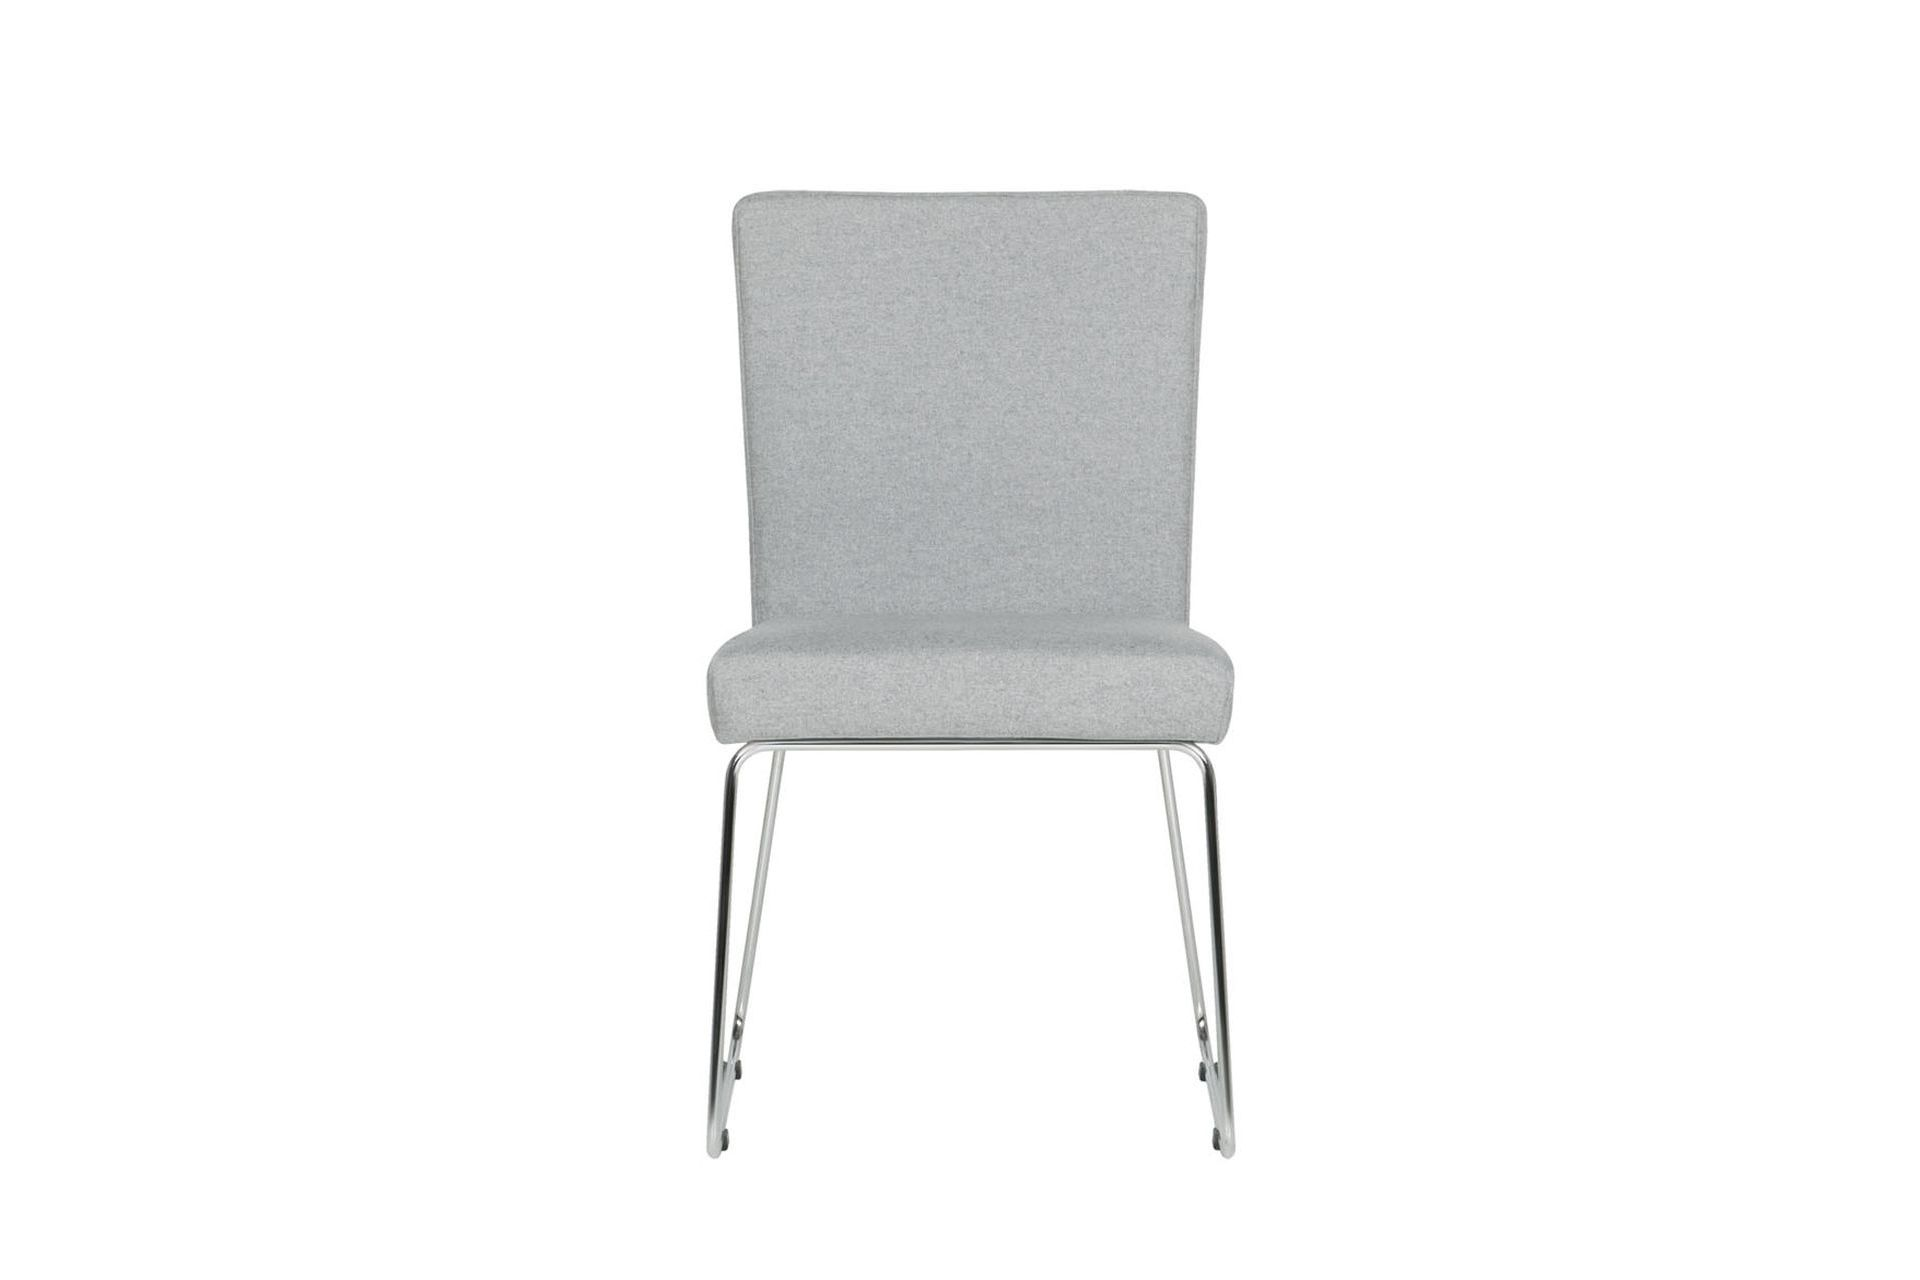 Кухонный стул Sits 15448926 от thefurnish